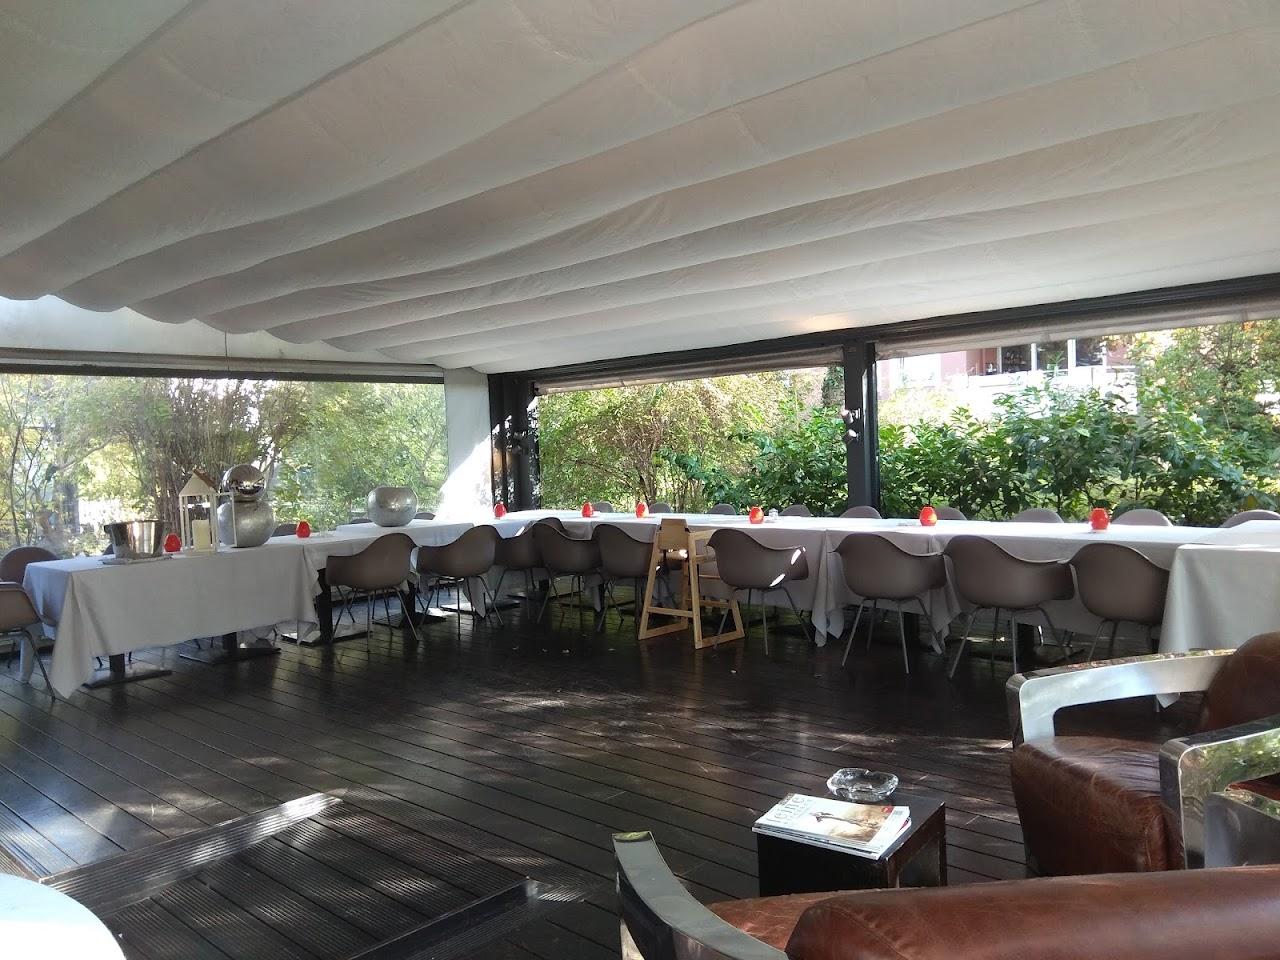 carmelo greco best restaurants firstguide. Black Bedroom Furniture Sets. Home Design Ideas